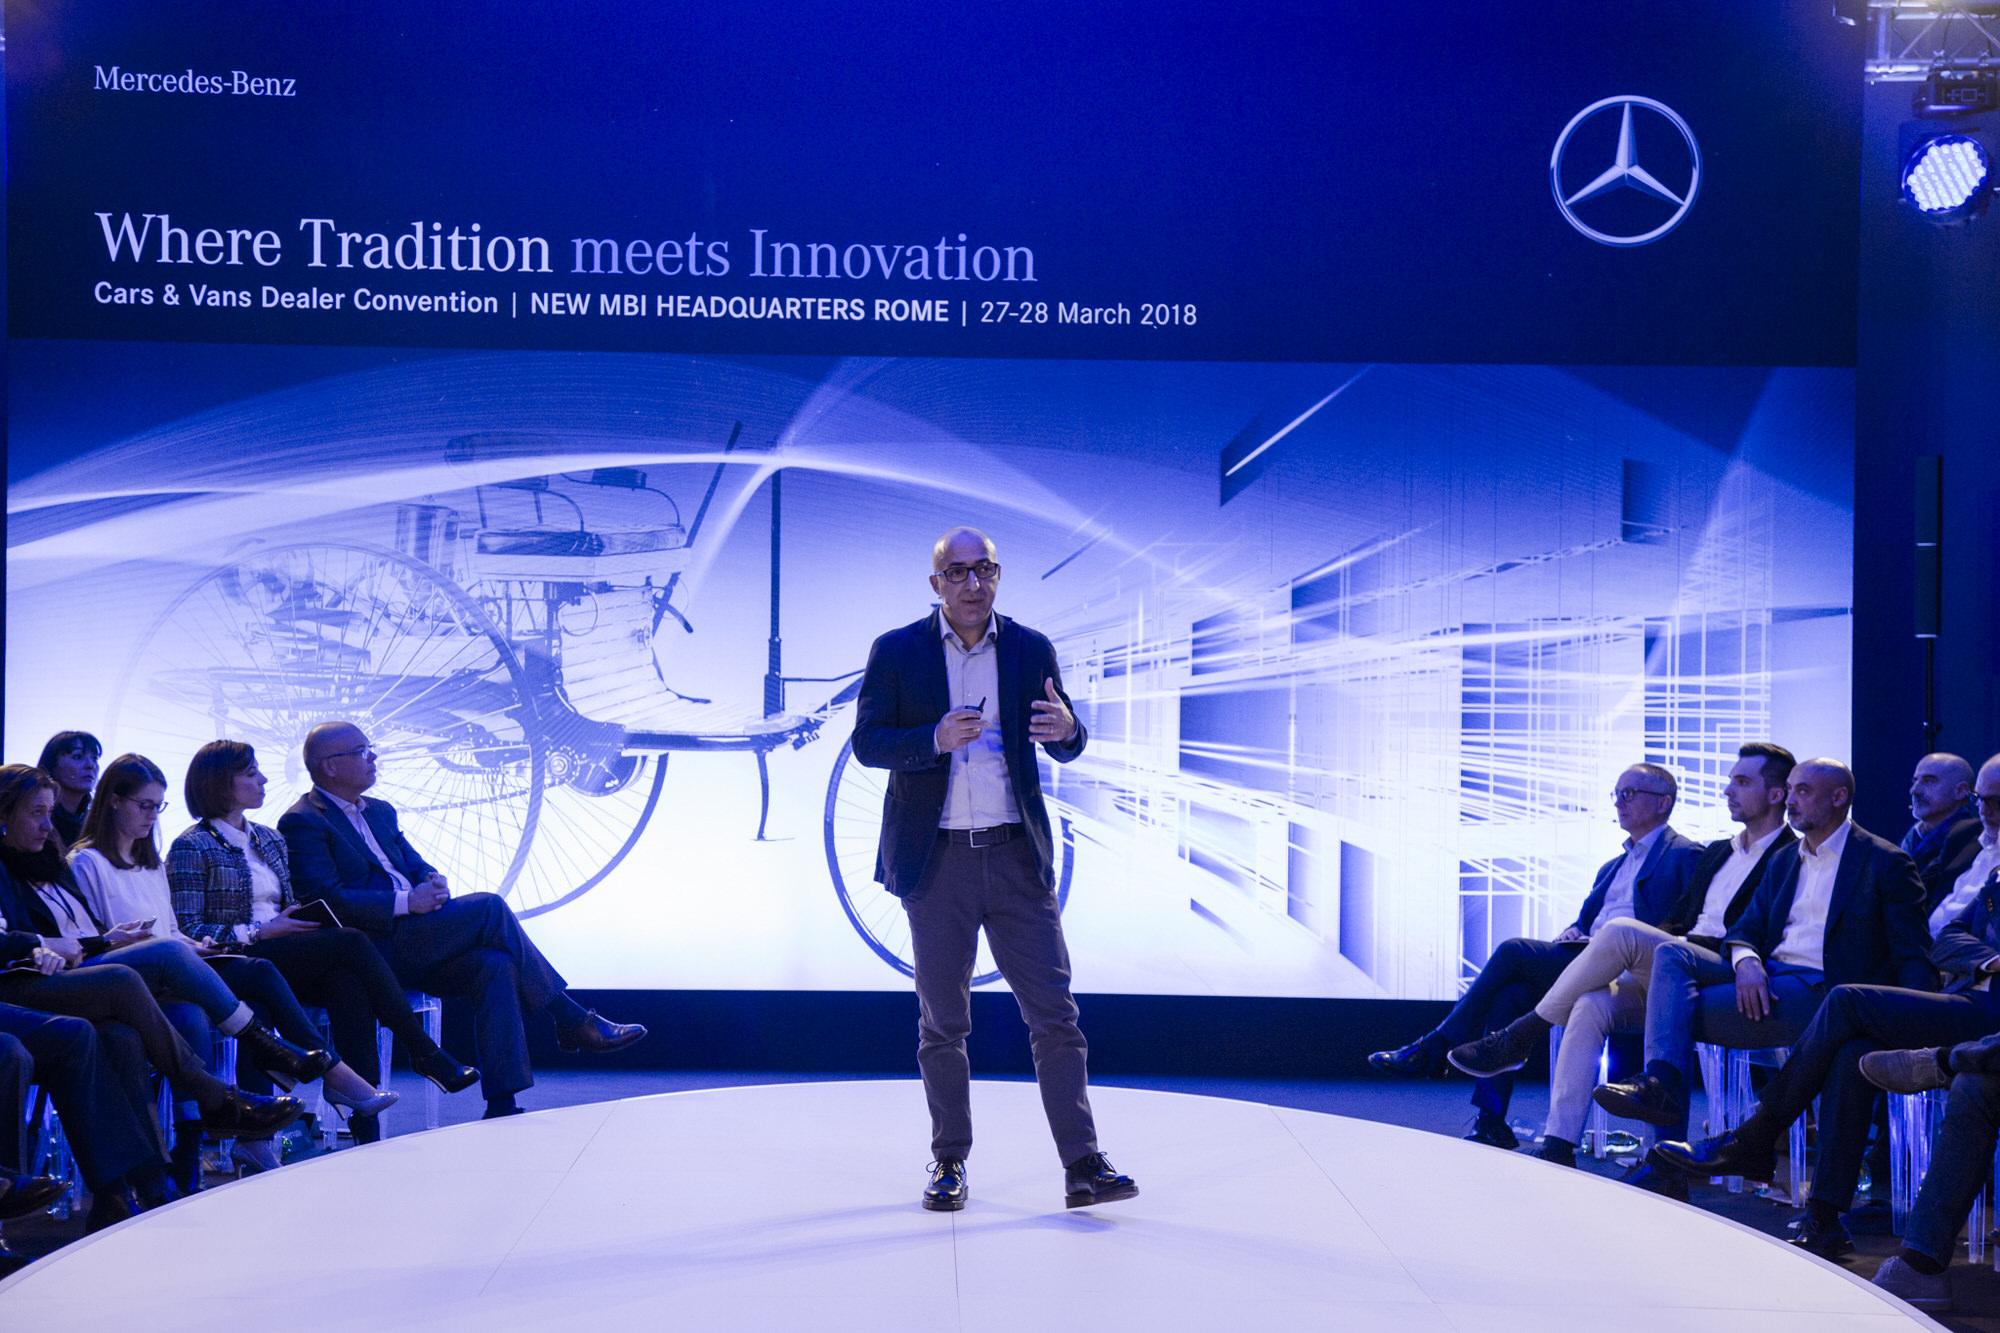 car-vans-dealer-convention-gruppo-peroni-eventi-05